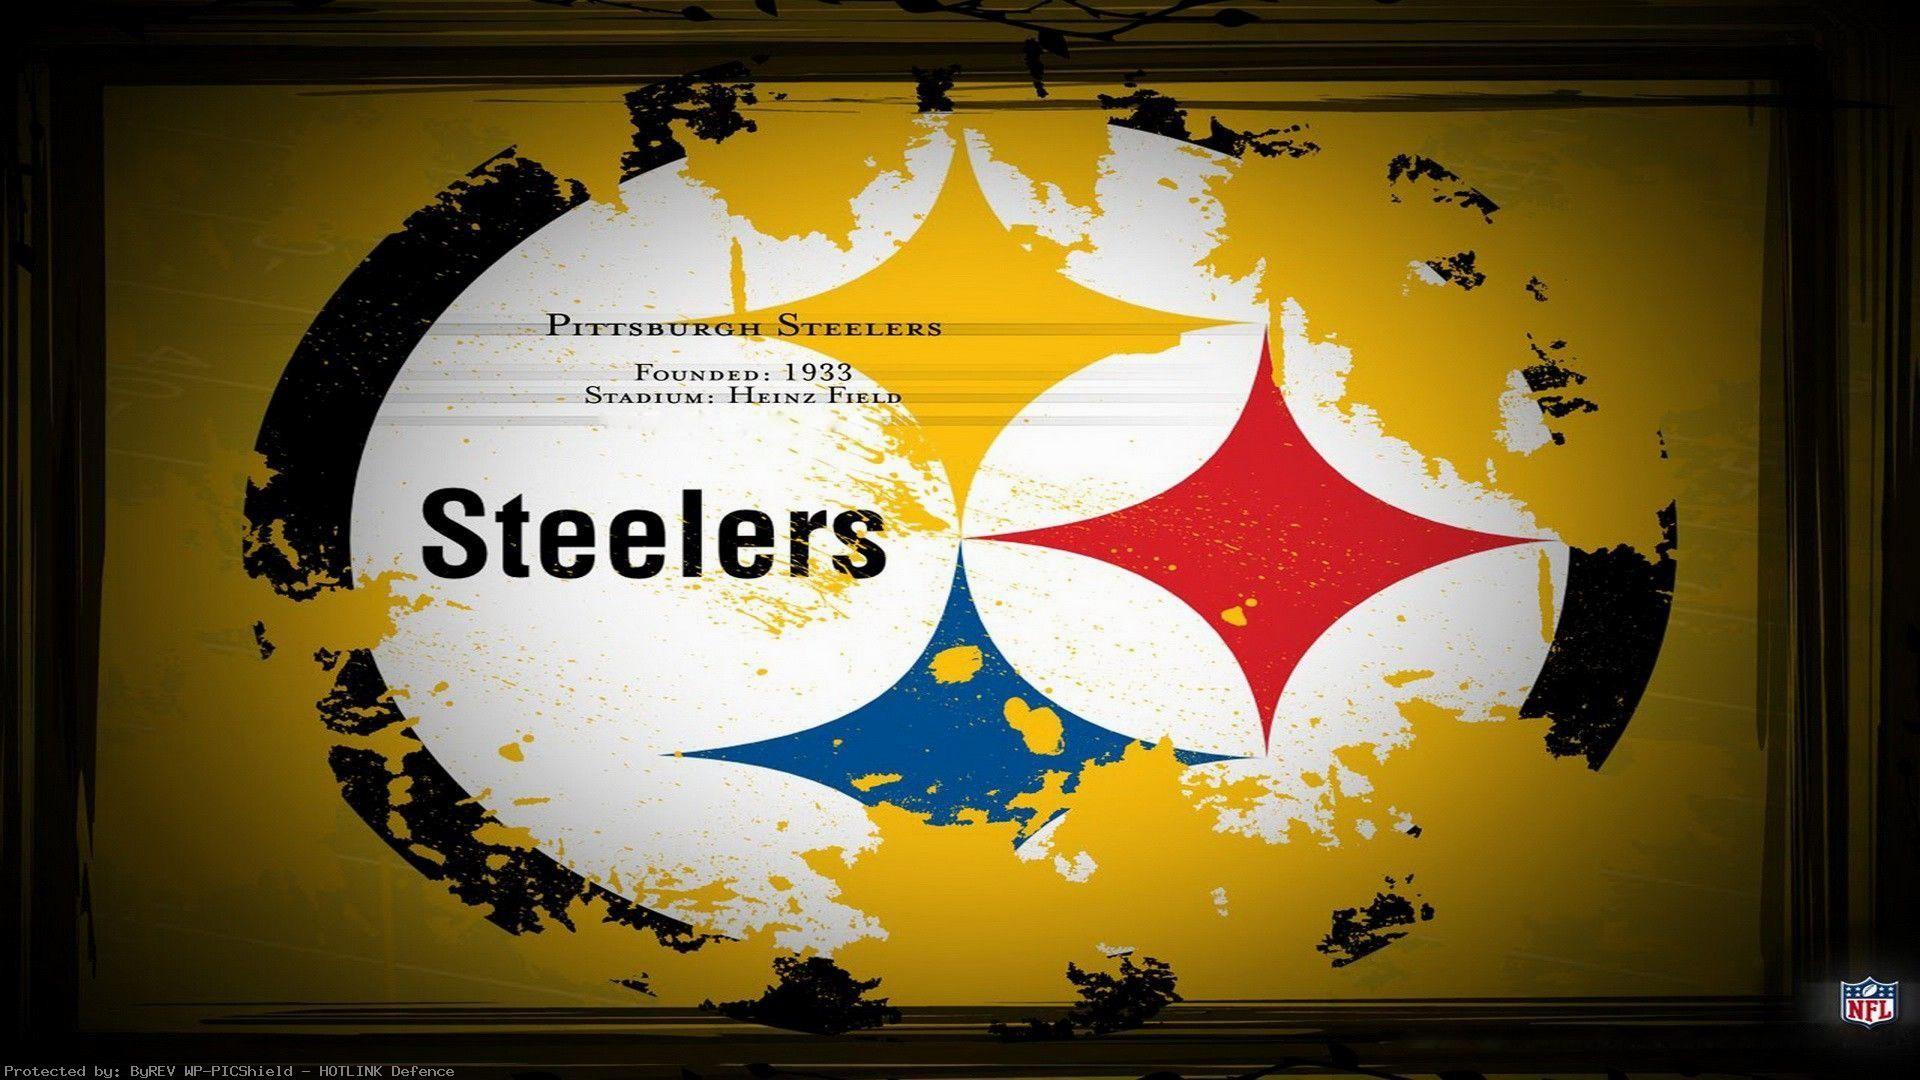 pittsburgh-steelers-logo-hd-images-desktop-wallpaper-wp60011016